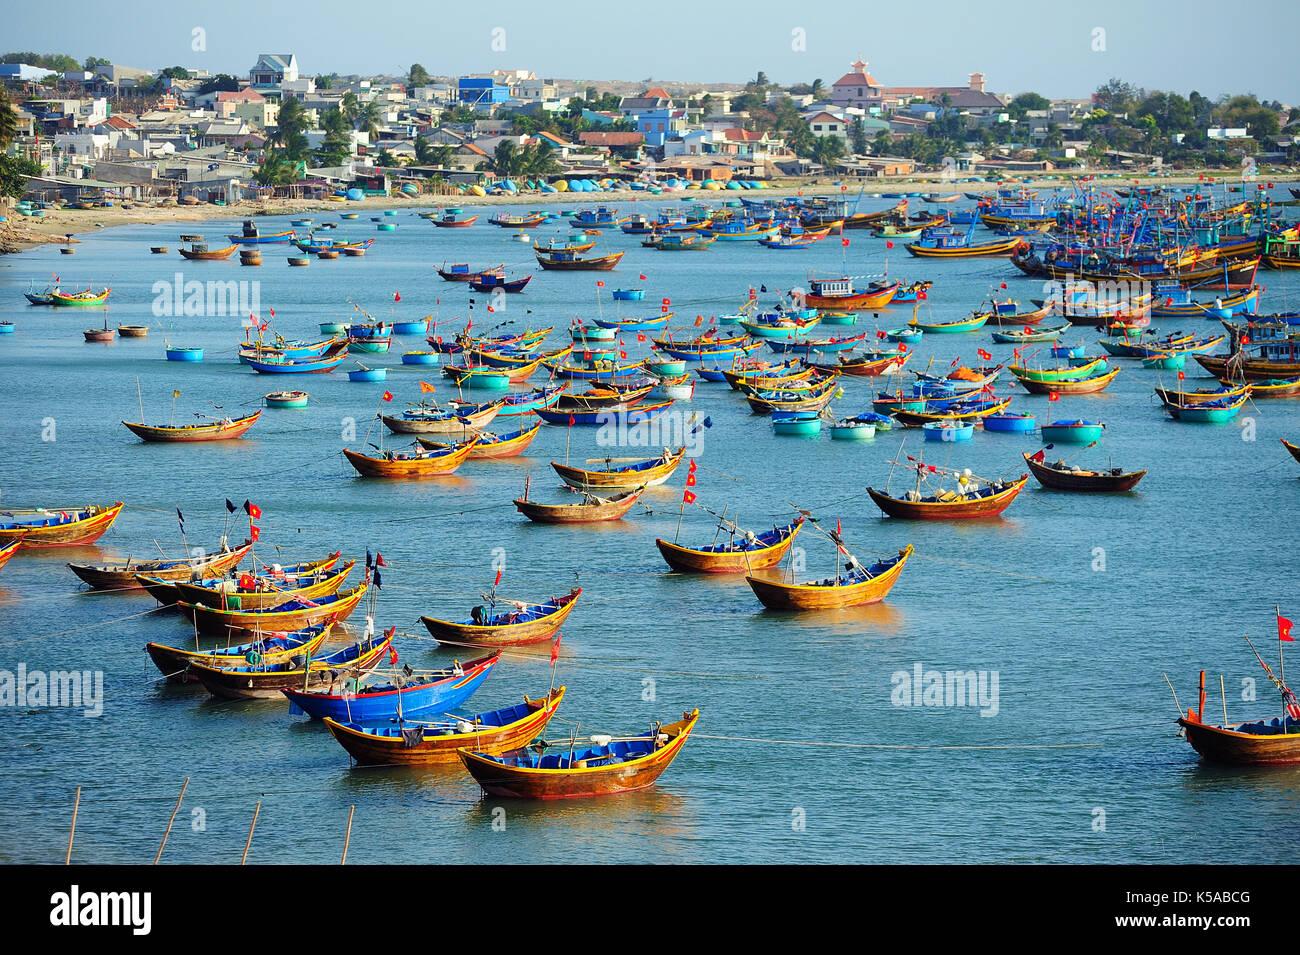 Fishing village harbor scenery in Mui Ne,Vietnam. - Stock Image